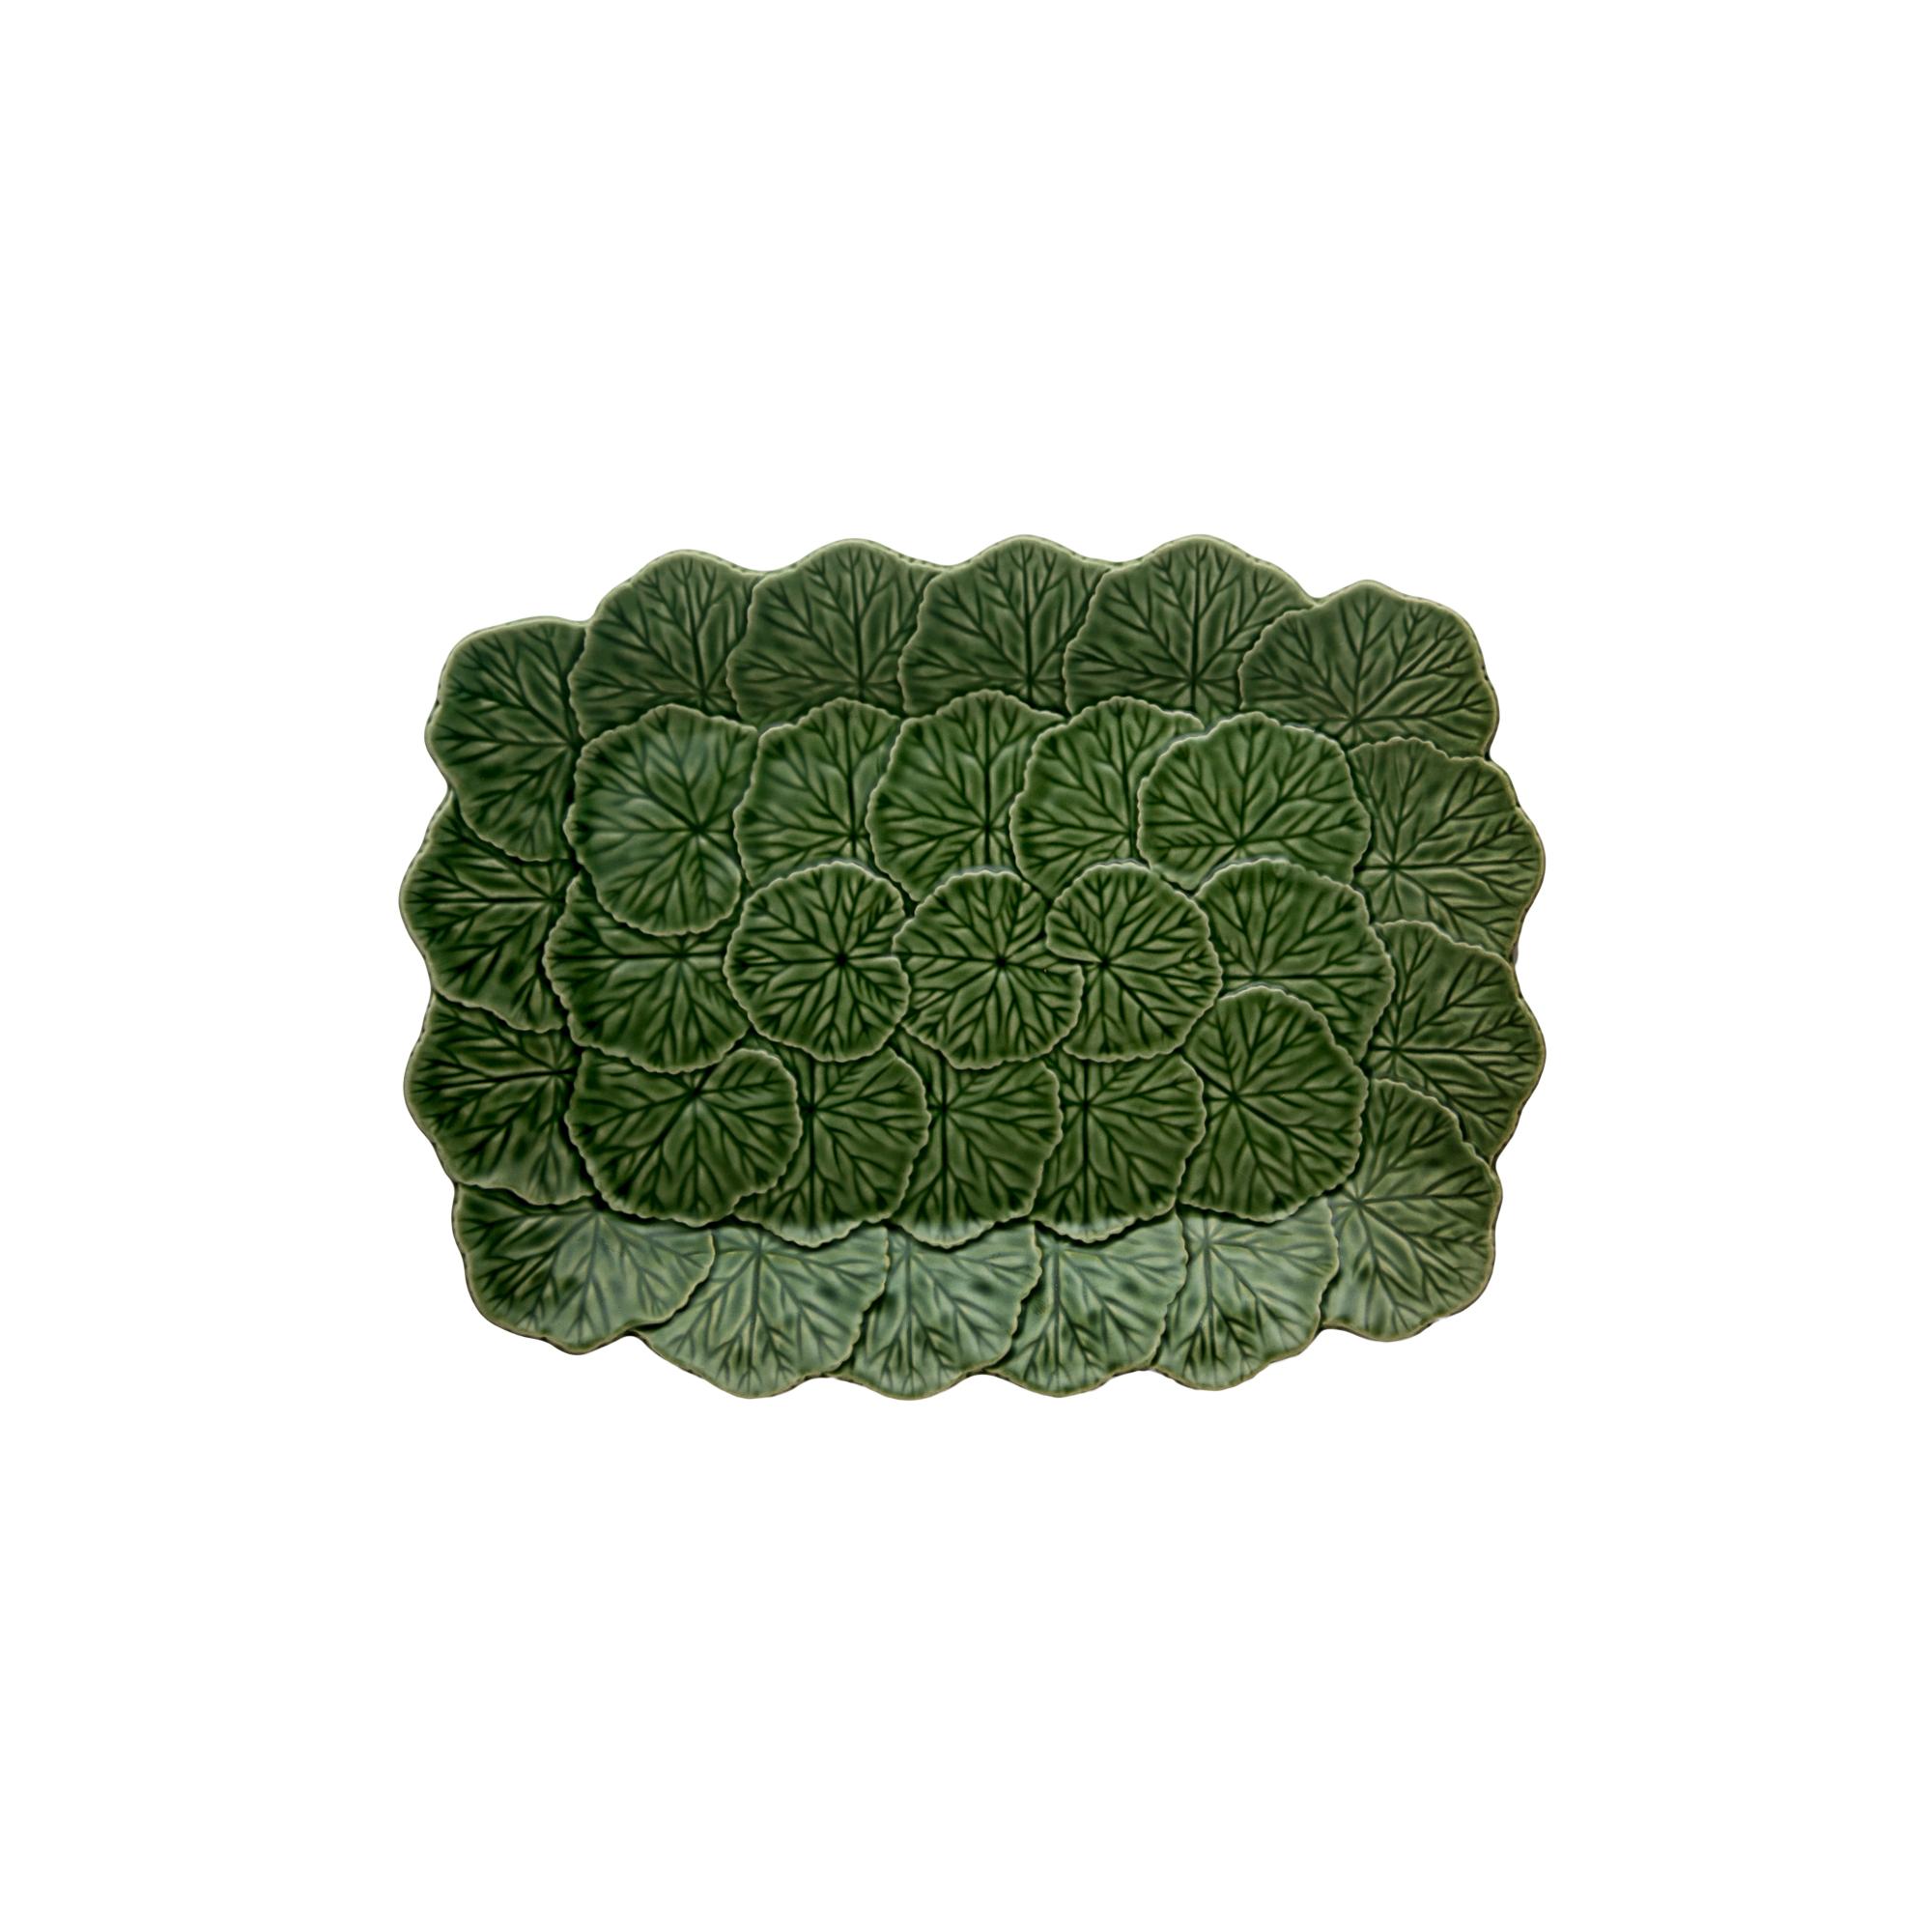 Bordallo Pinheiro Geranium Green Relief Platter